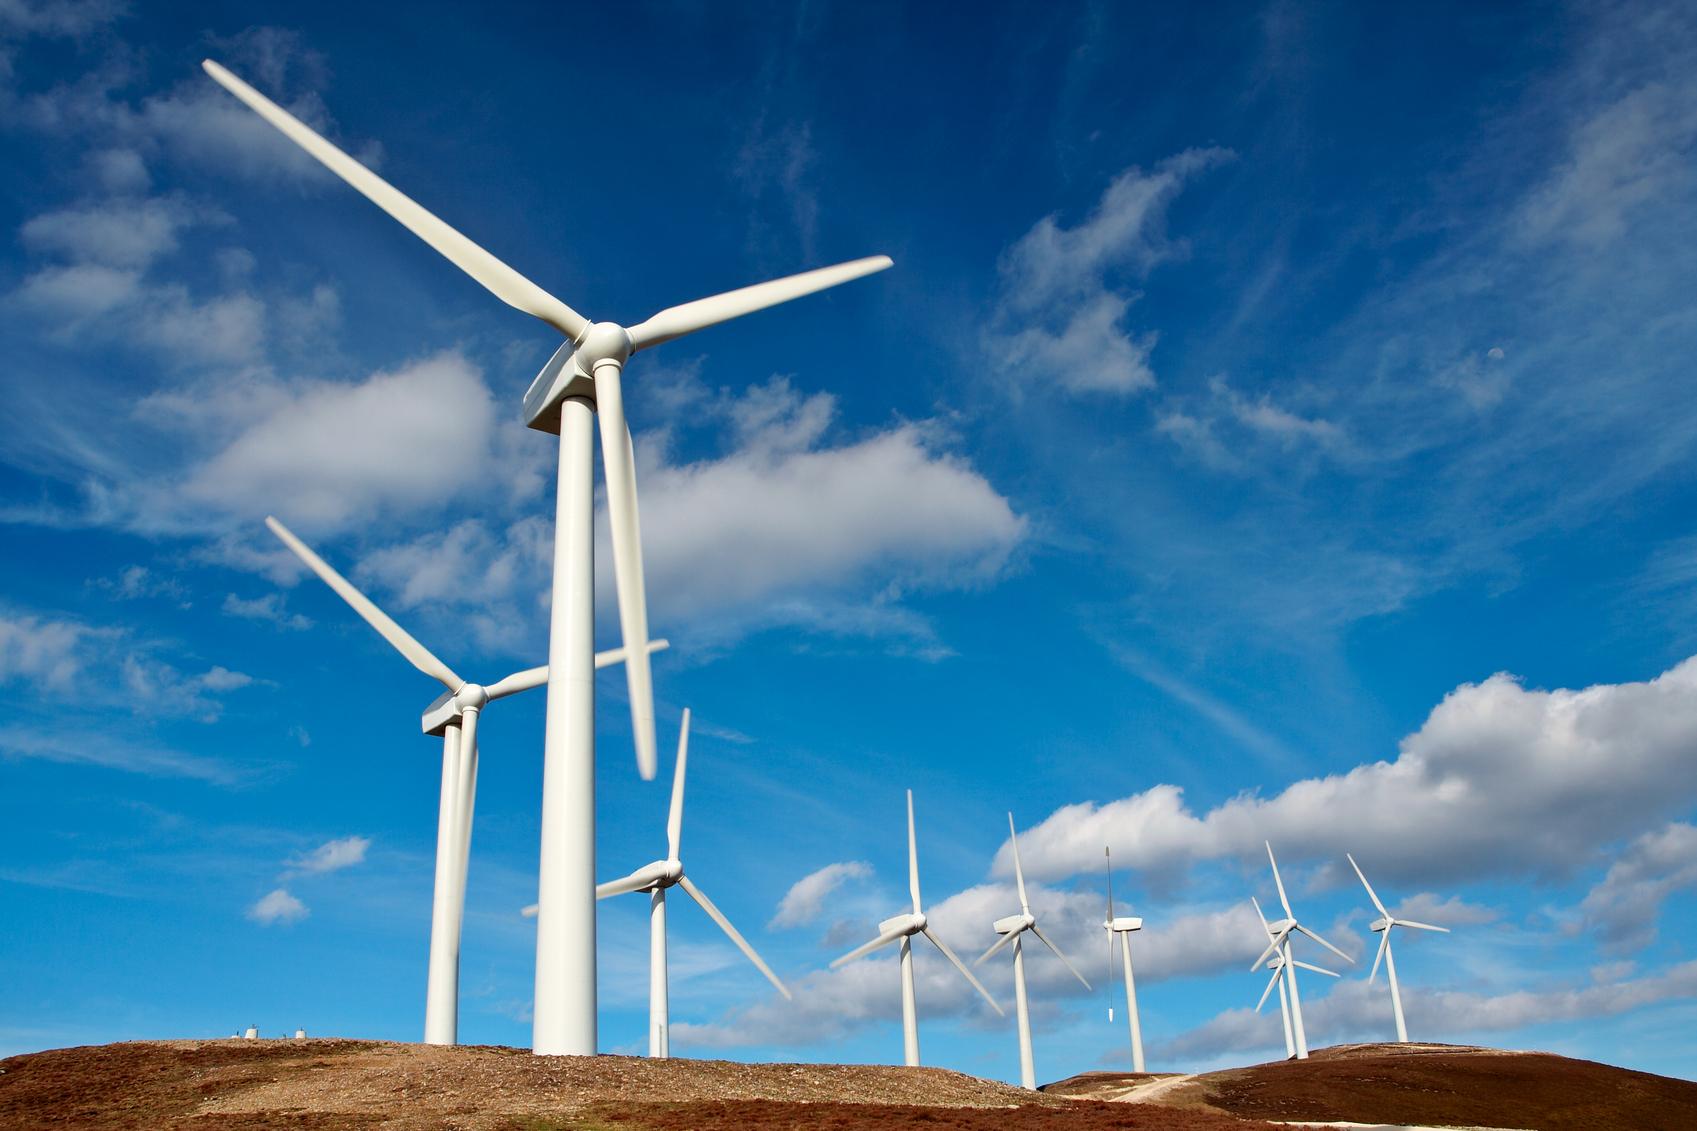 Impianto eolico - Wind turbines farm